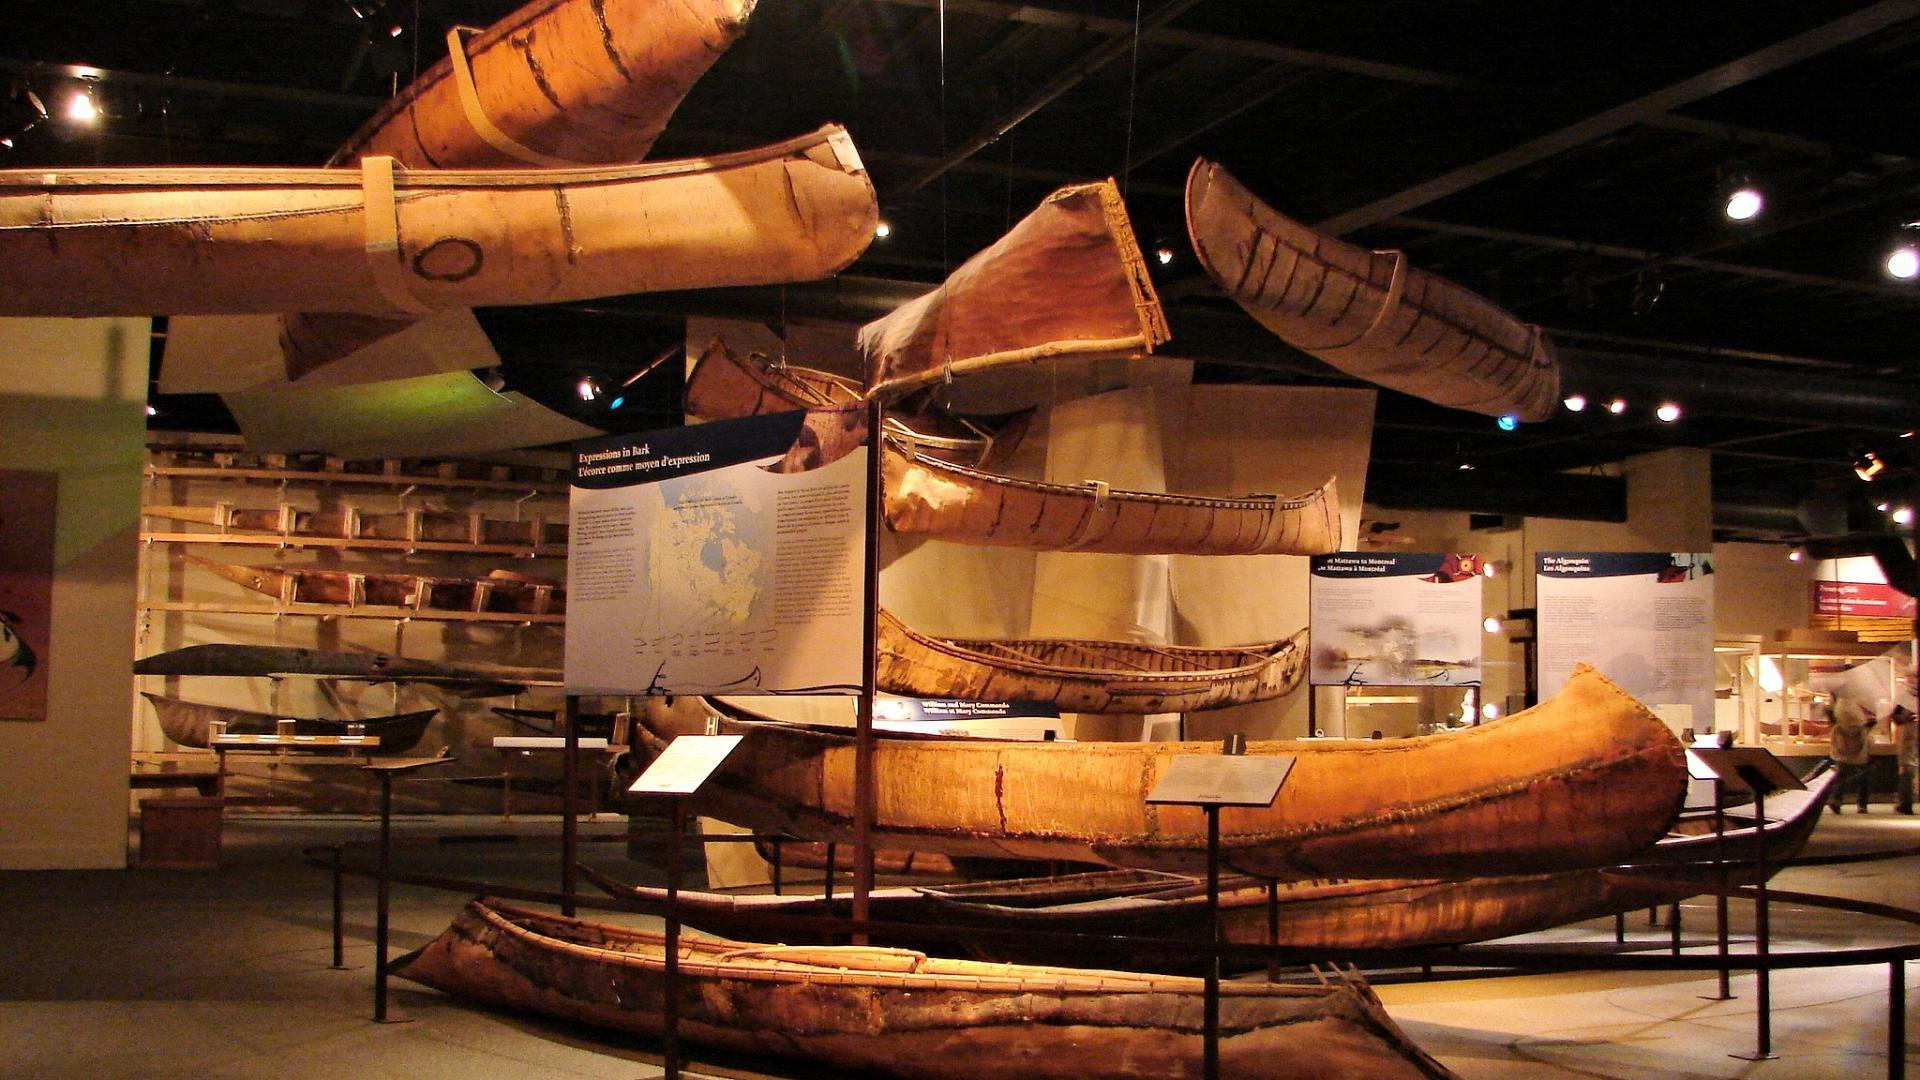 Image Via: Canadian Canoe Museum